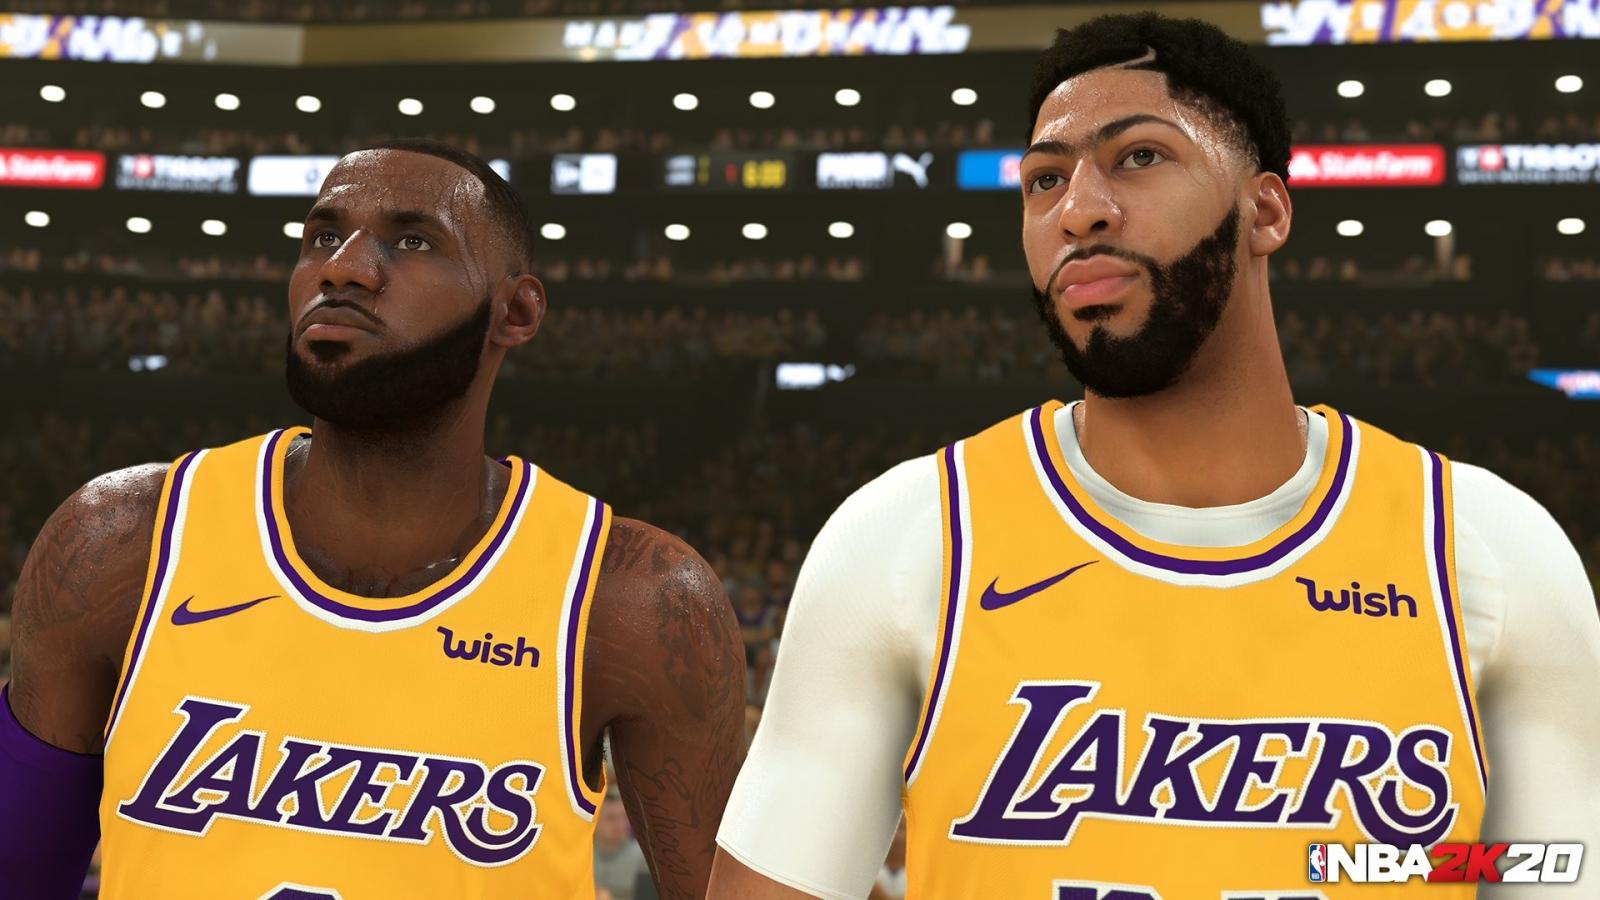 Switch NBA 2K20 Legend Edition